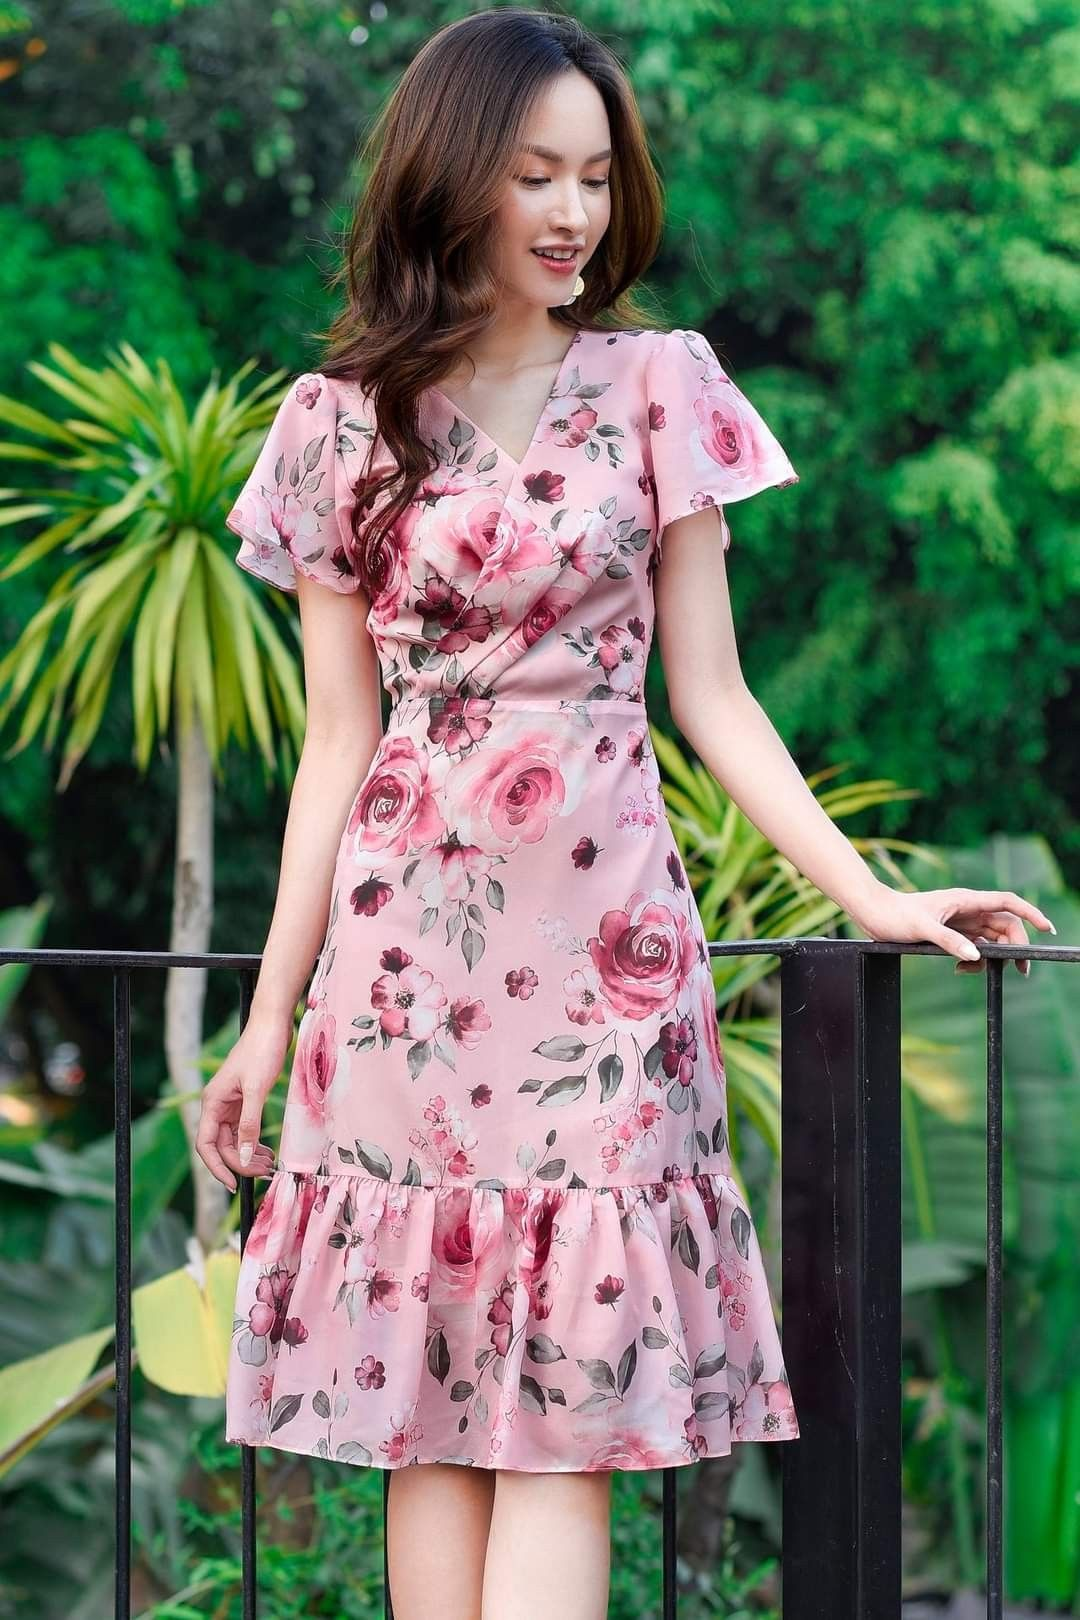 Pin de Head to Footsies em Dresses | Belos vestidos, Vestidos